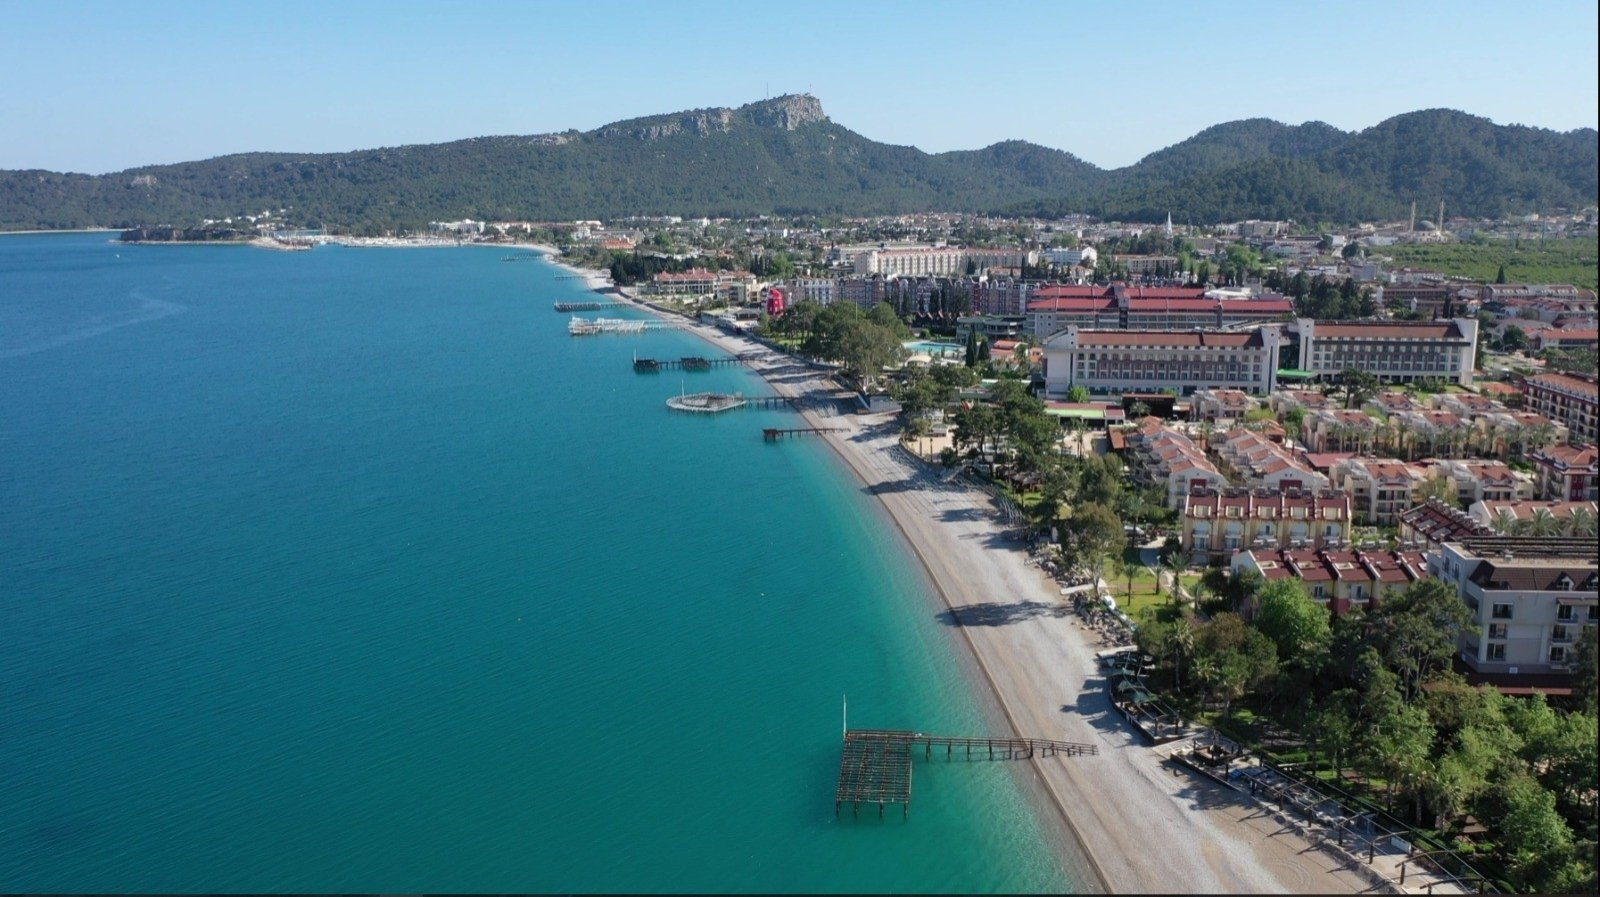 A view on Turkey's Antalya province on April 14, 2021. (IHA Photo)